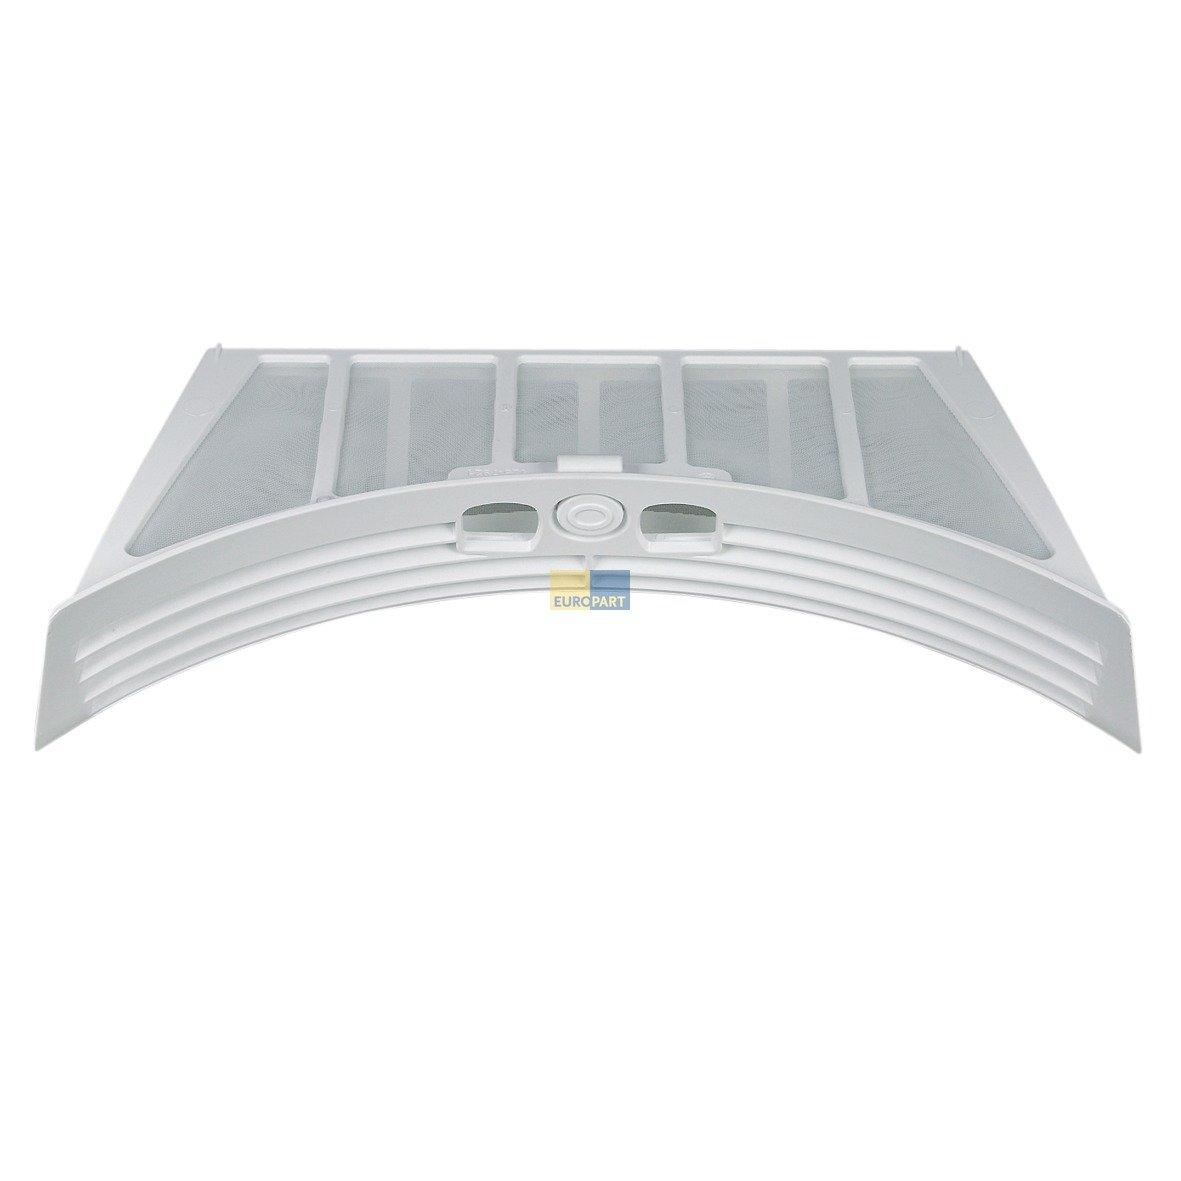 Genuine Electrolux AEG Zanussi Tumble Dryer Lint Filter With Pocket 1257921104